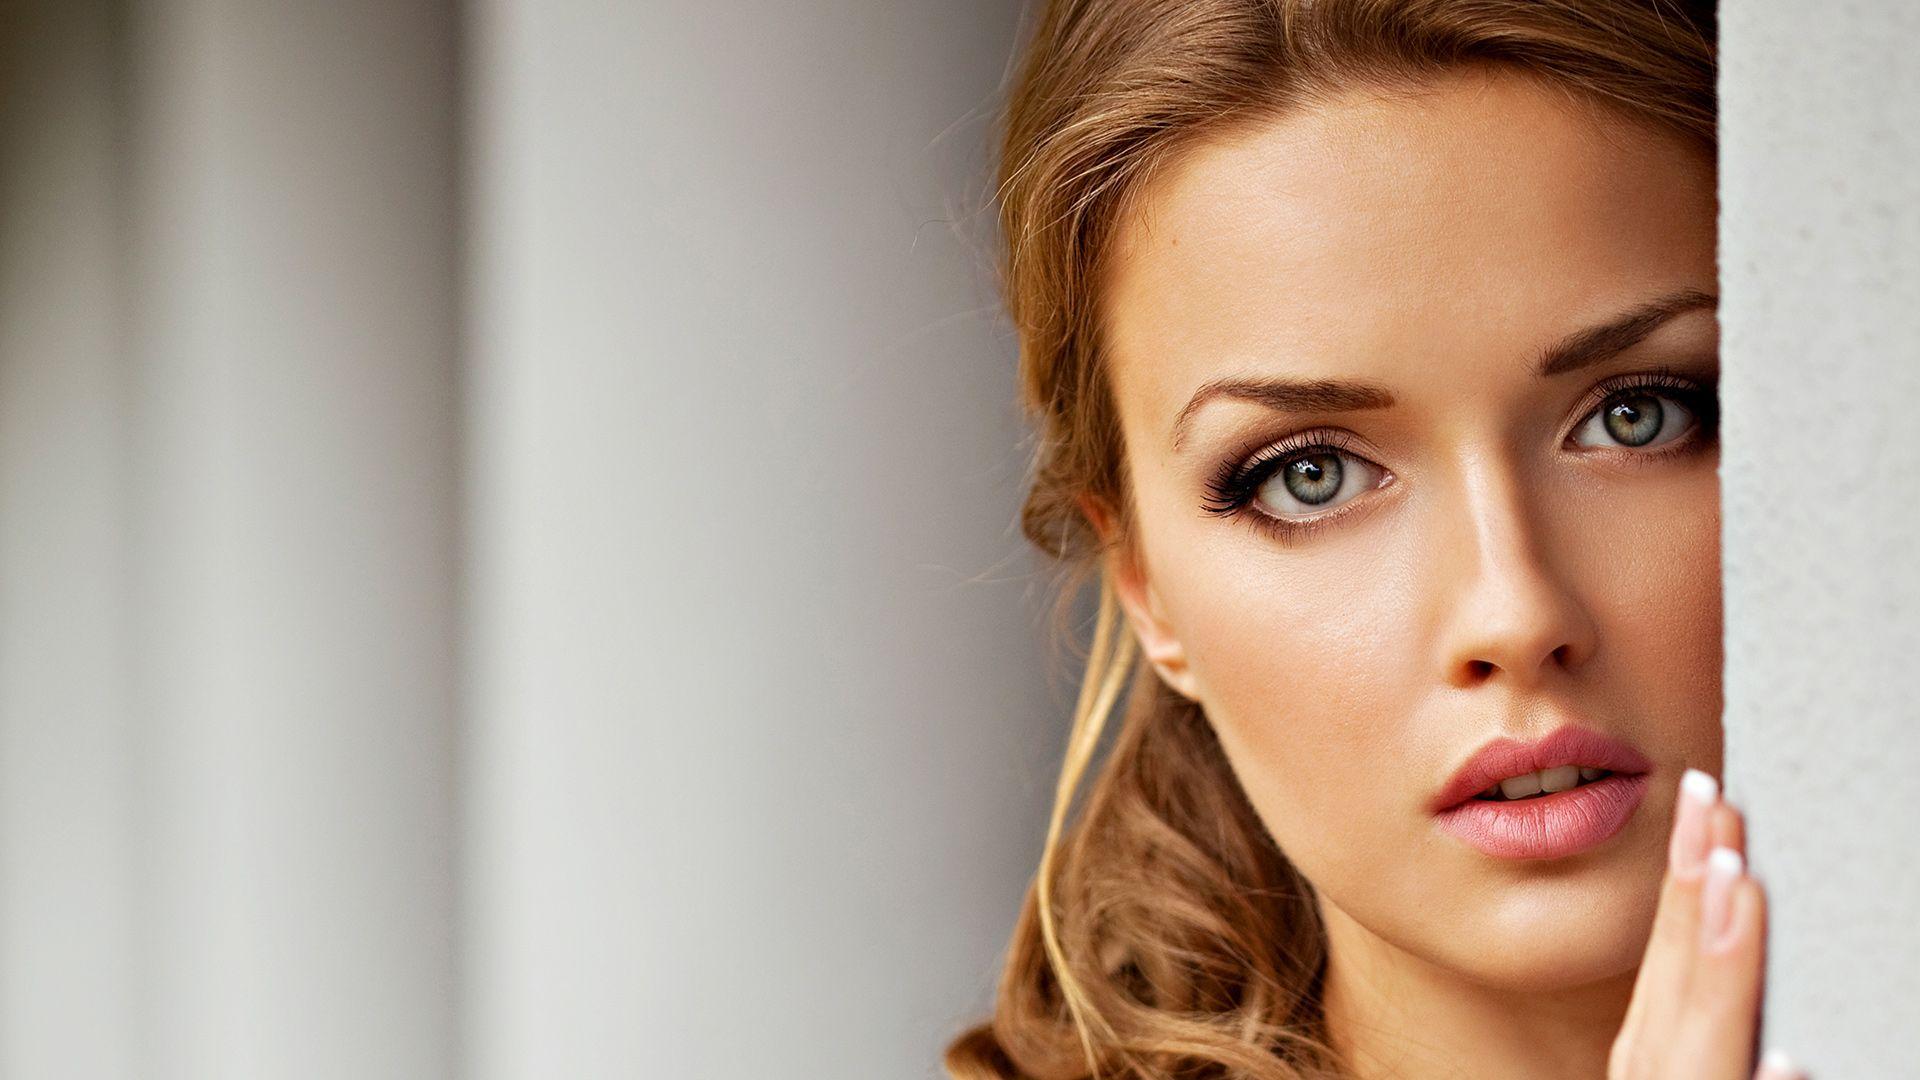 Image result for beauty face desktop wallpaper